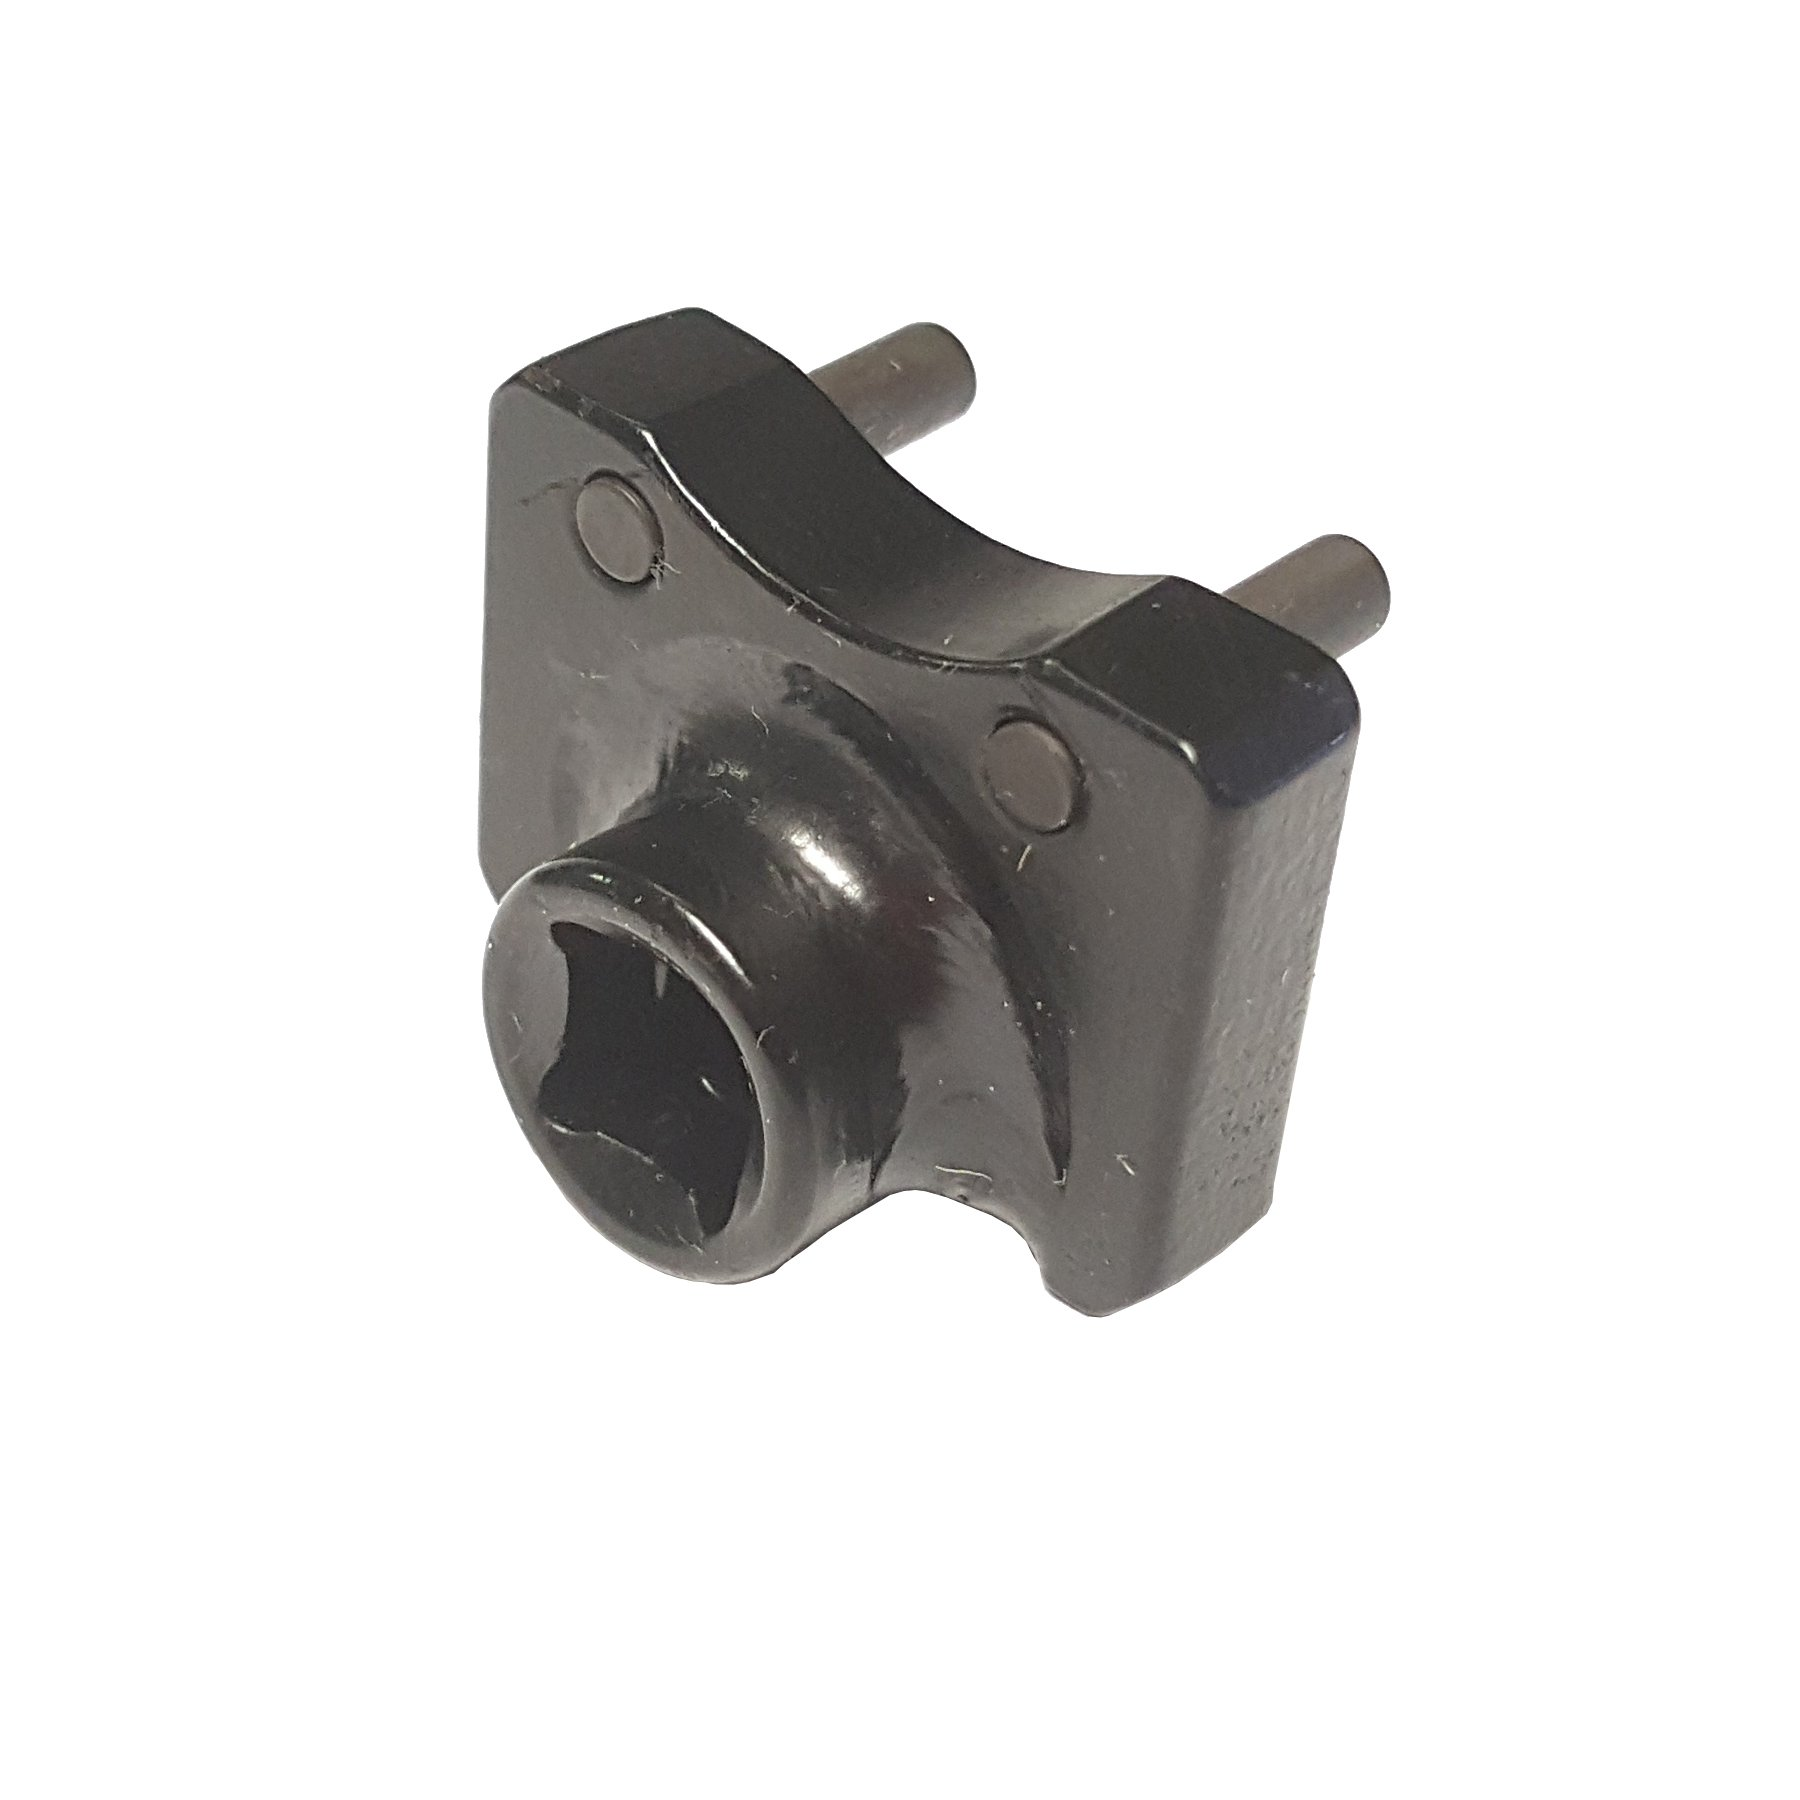 AS4577 Tensioner Adjuster